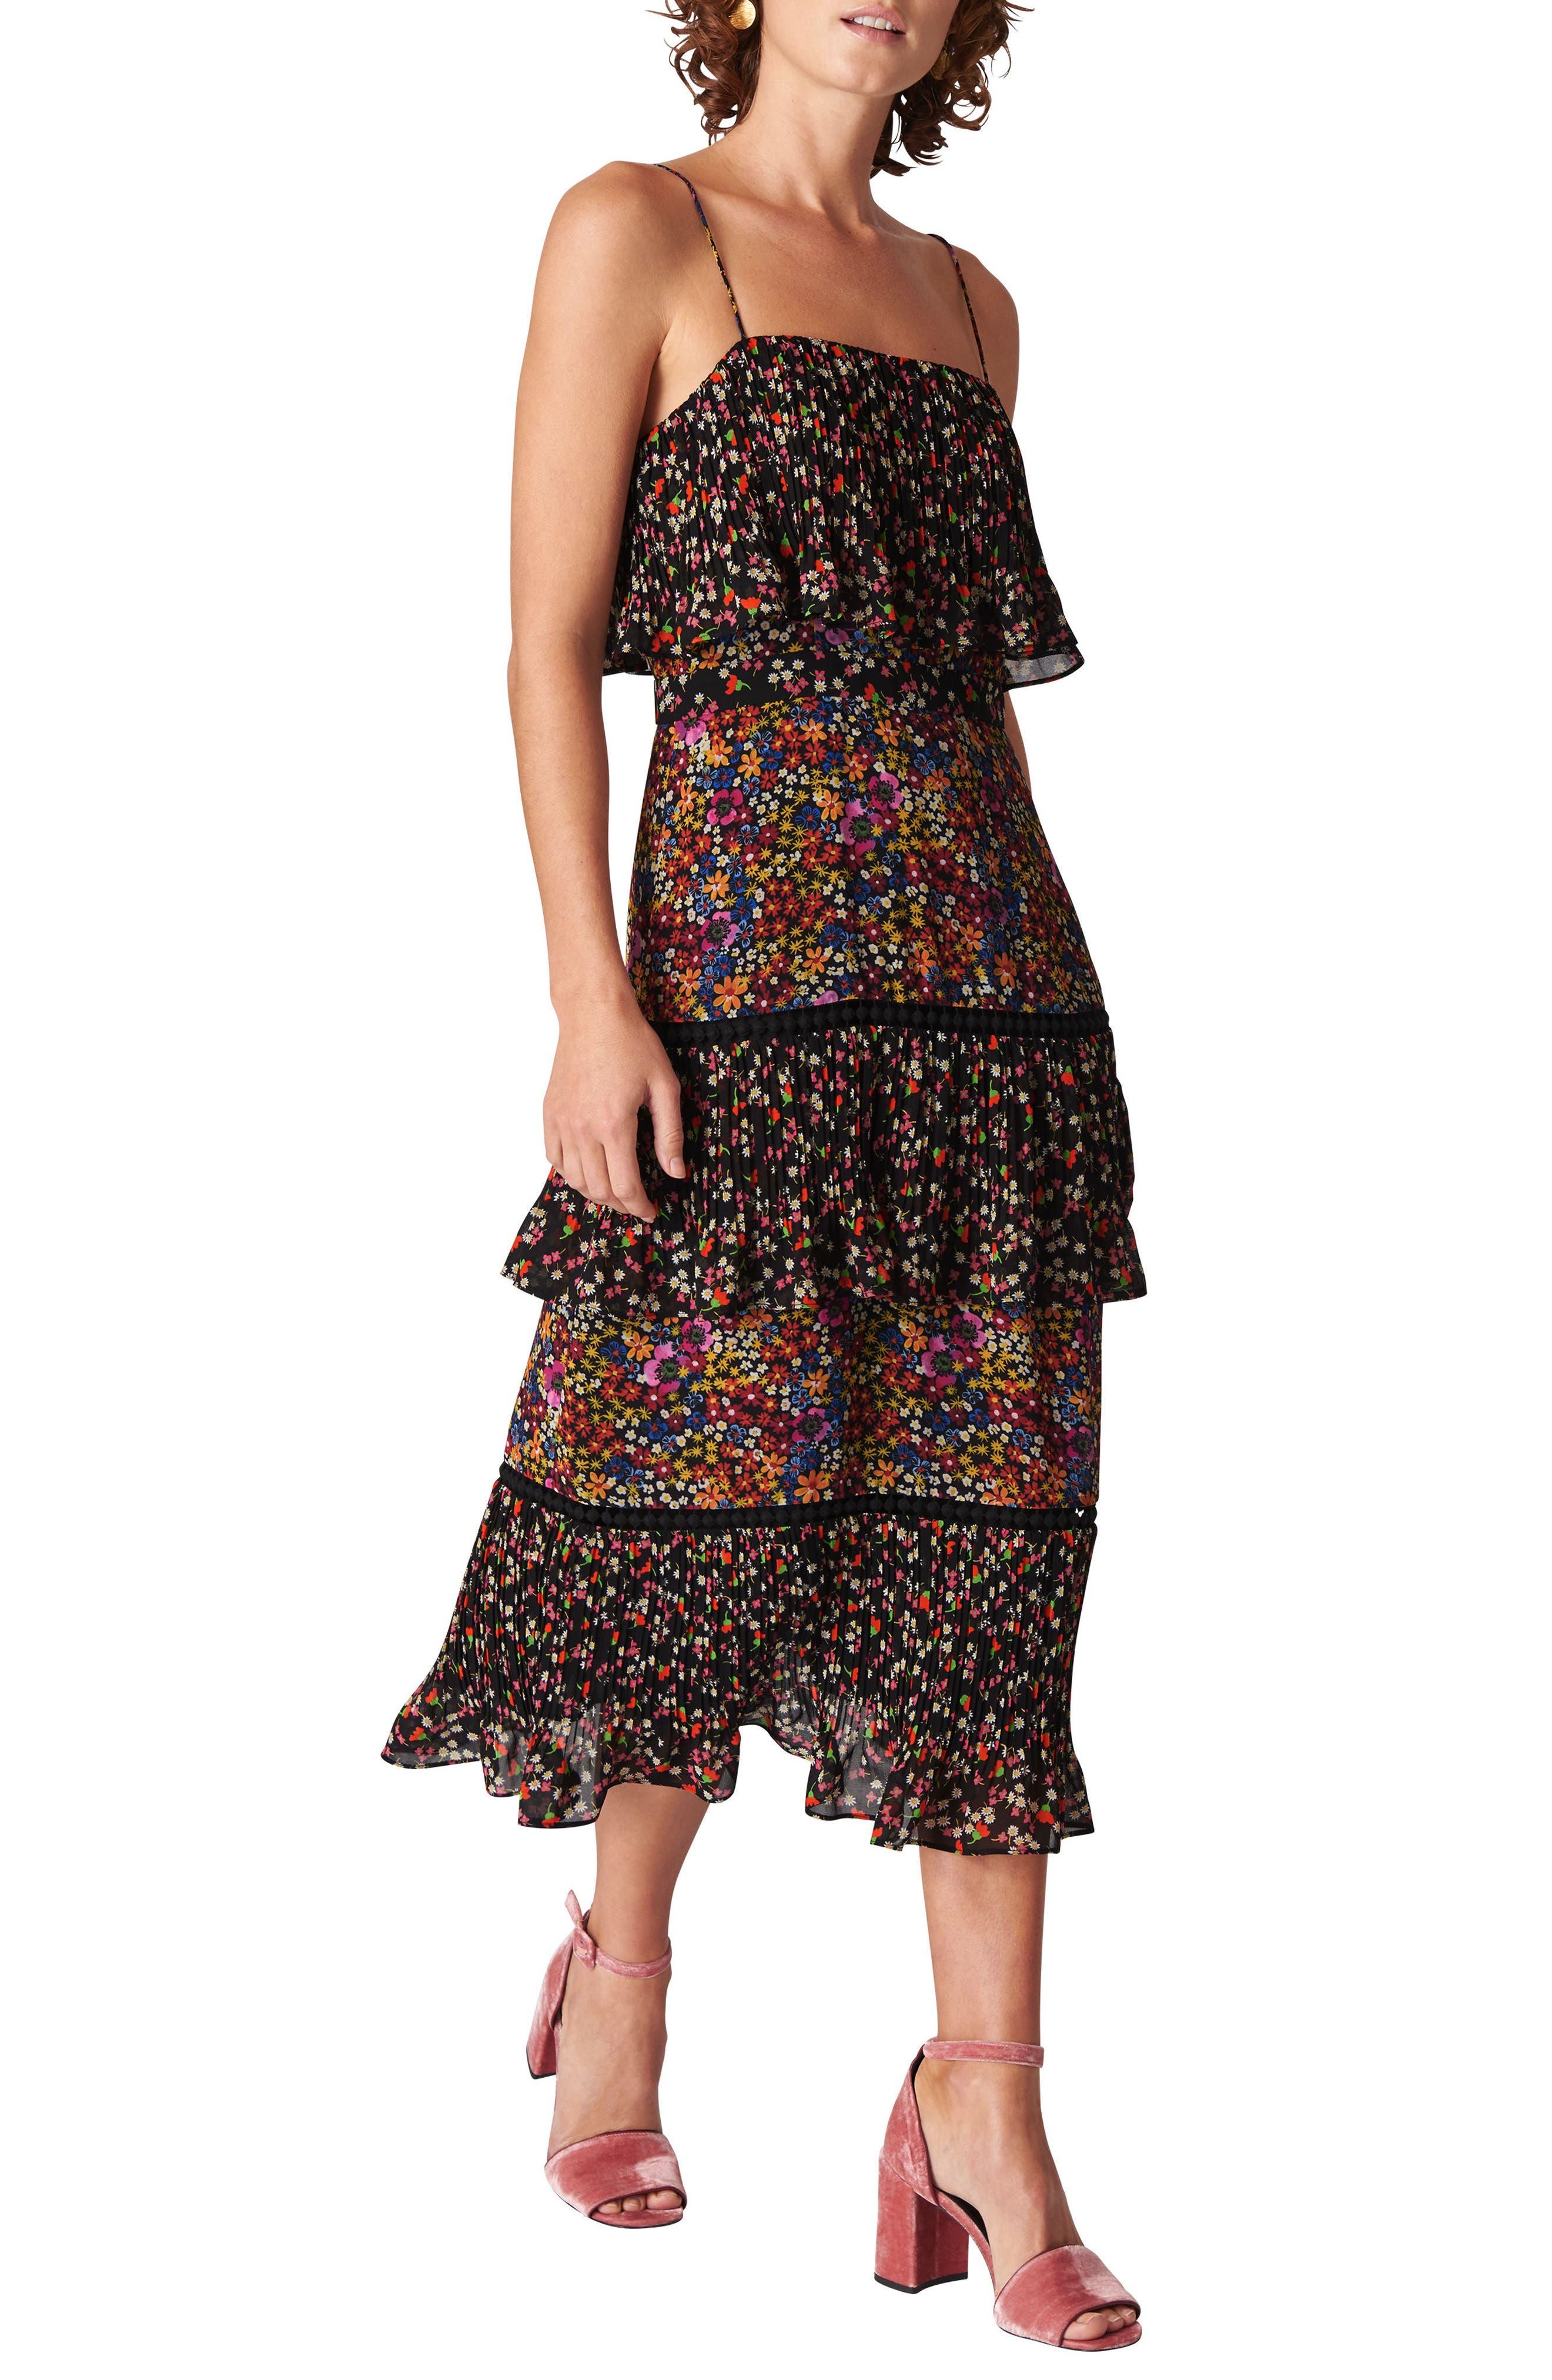 Skylar Peony Print Tiered Dress,                             Main thumbnail 1, color,                             BLACK/ MULTI